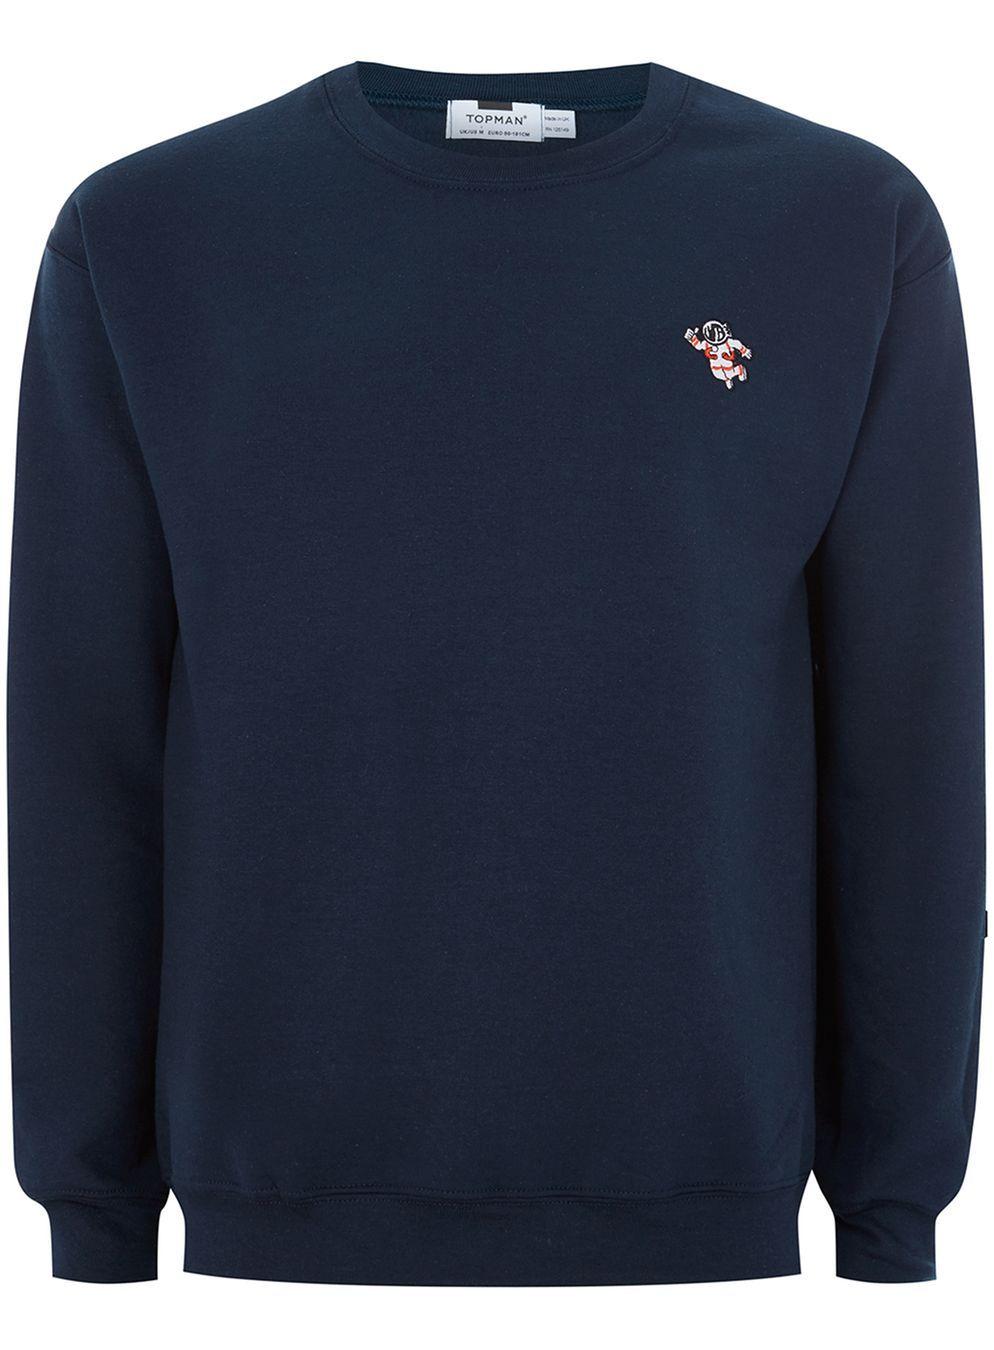 6e48775c0 Navy Astronaut Sweatshirt | Style | Sweatshirts, Astronaut, Navy